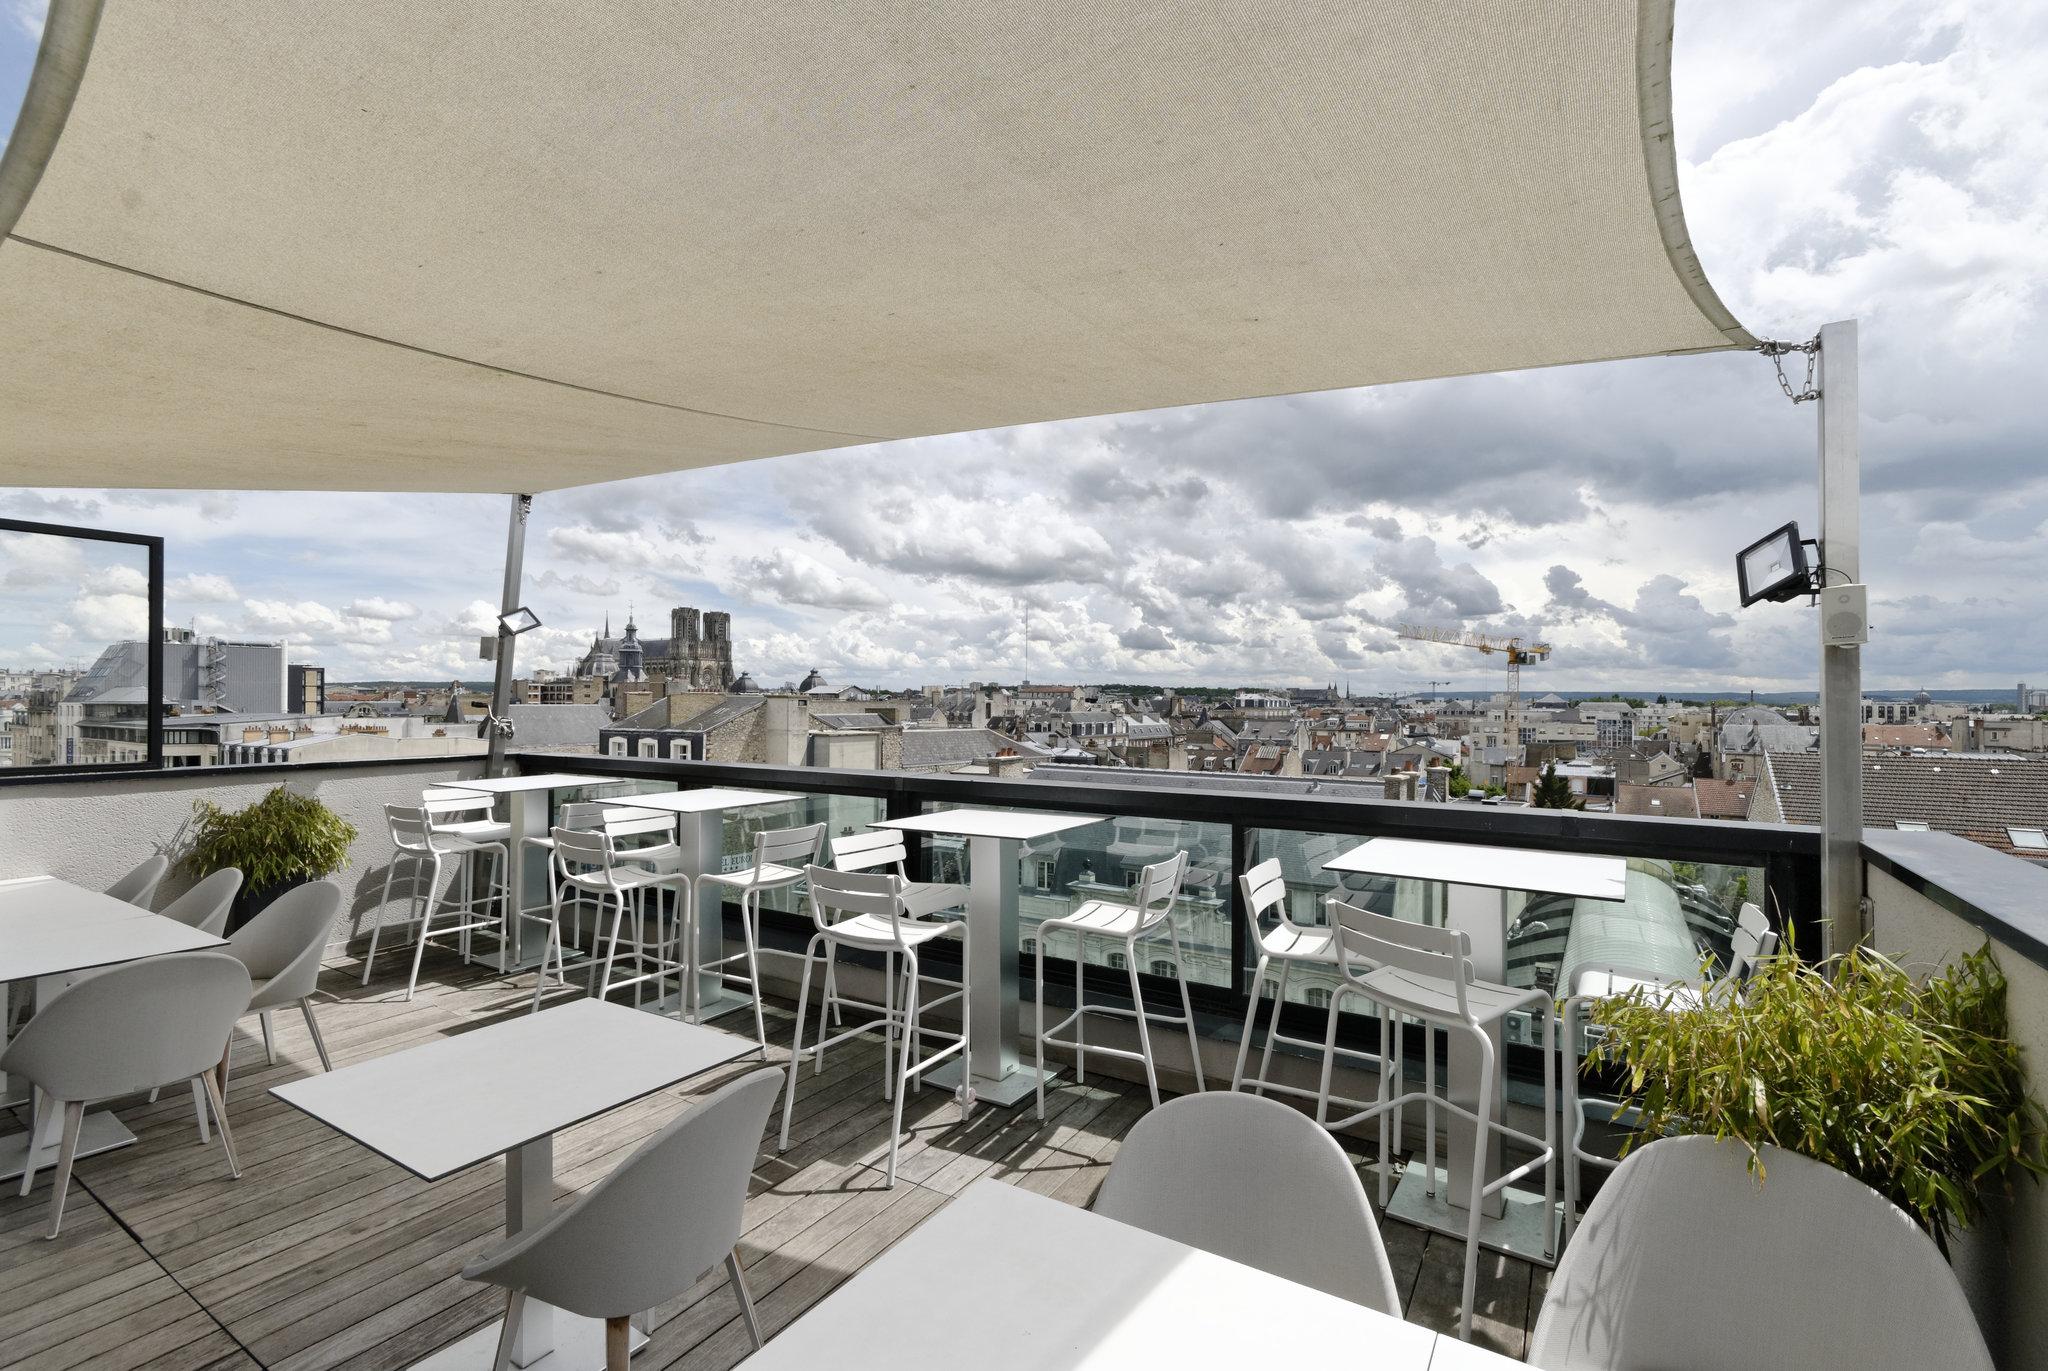 Holiday Inn Reims - City Centre